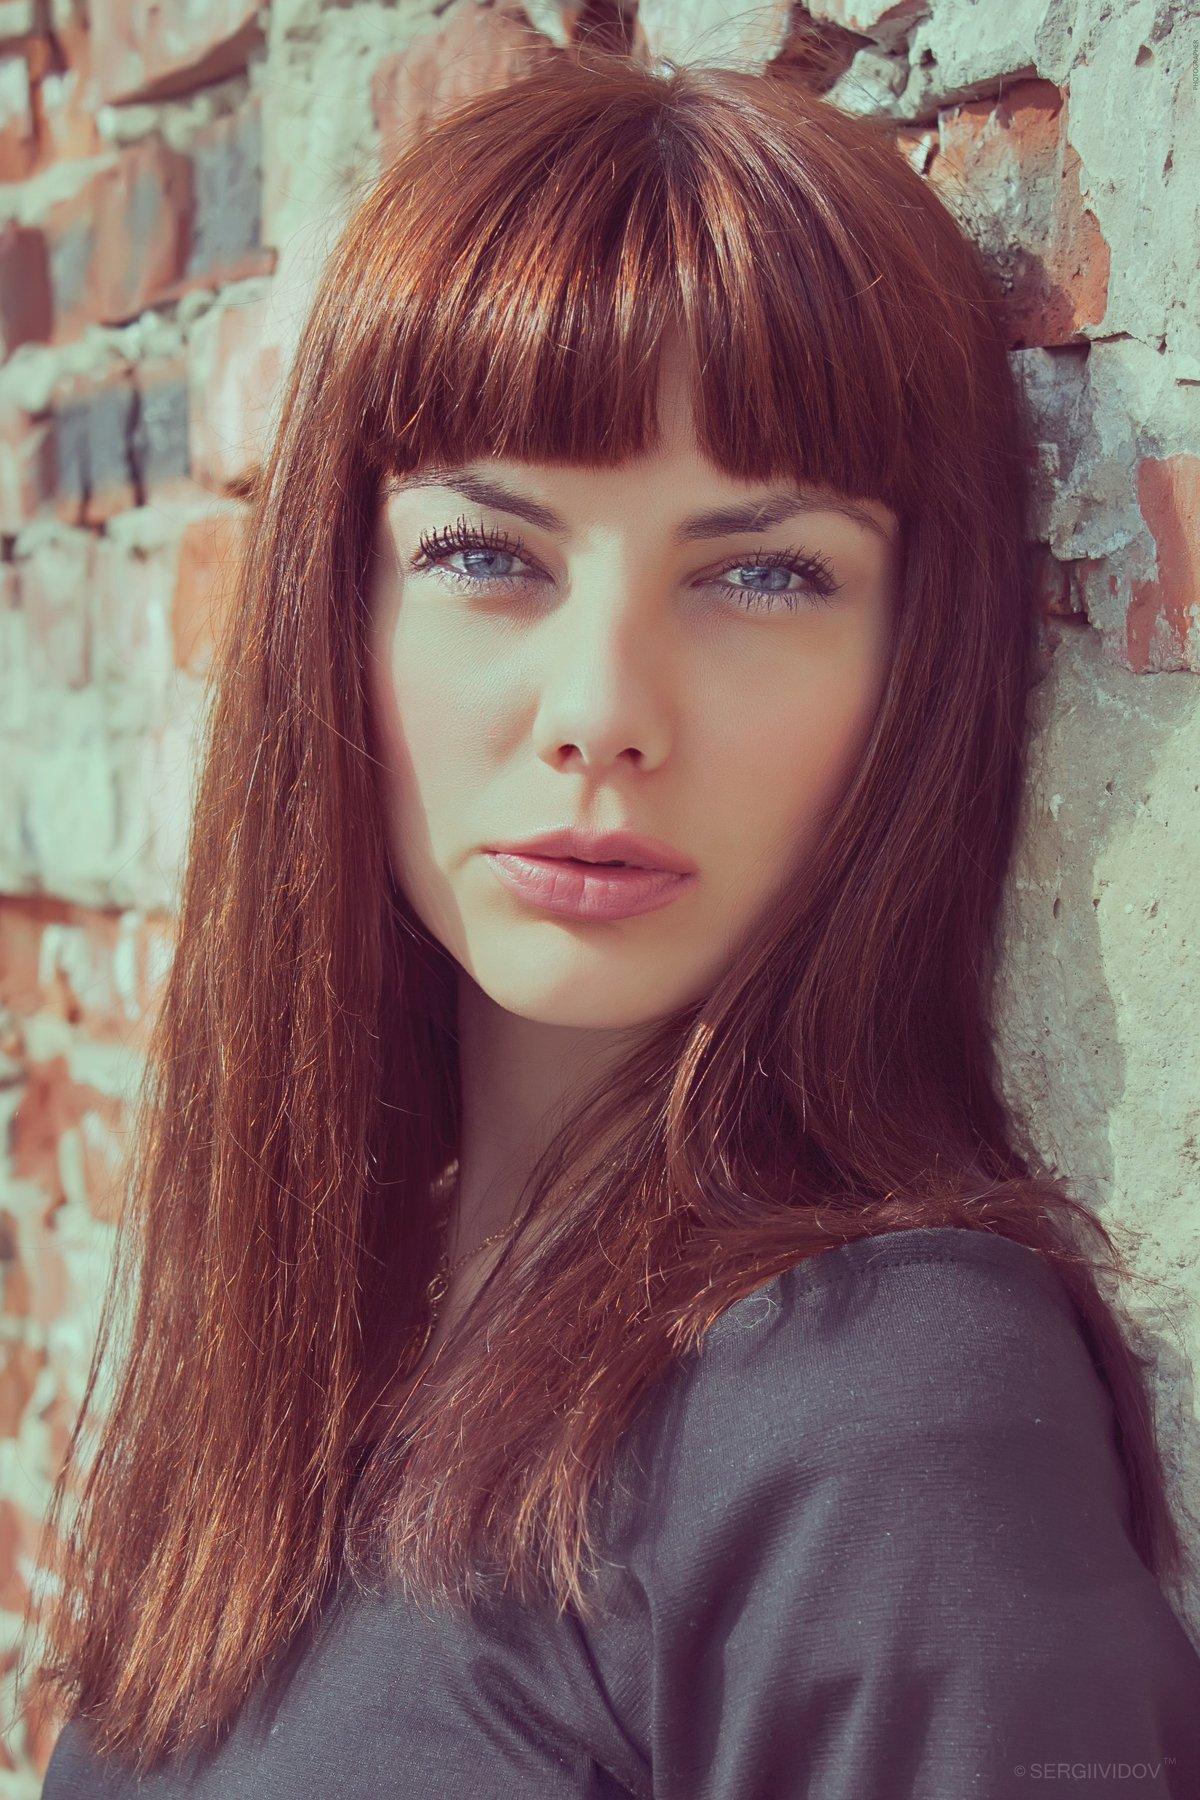 девочка, портрет, лето, Sergii Vidov